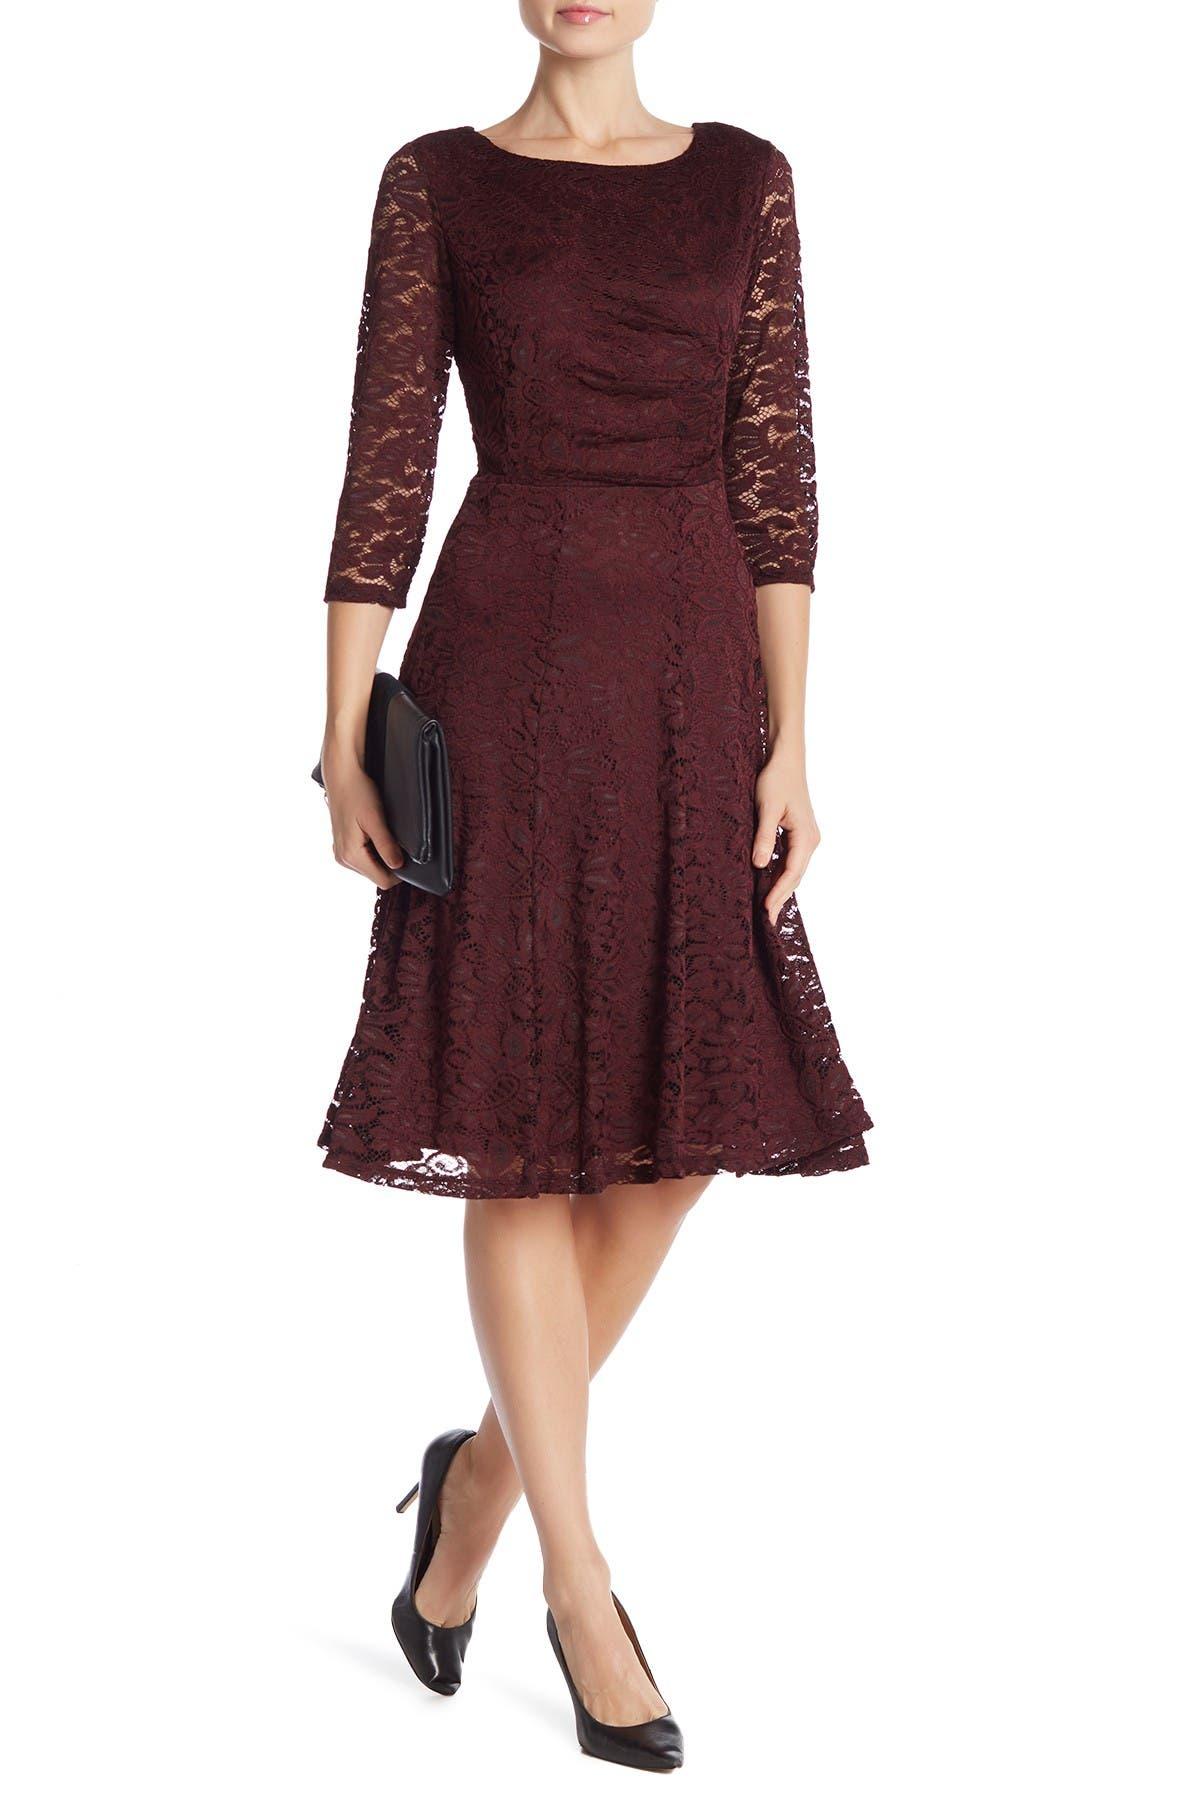 Image of Sandra Darren 3/4 Sleeve Lace Dress